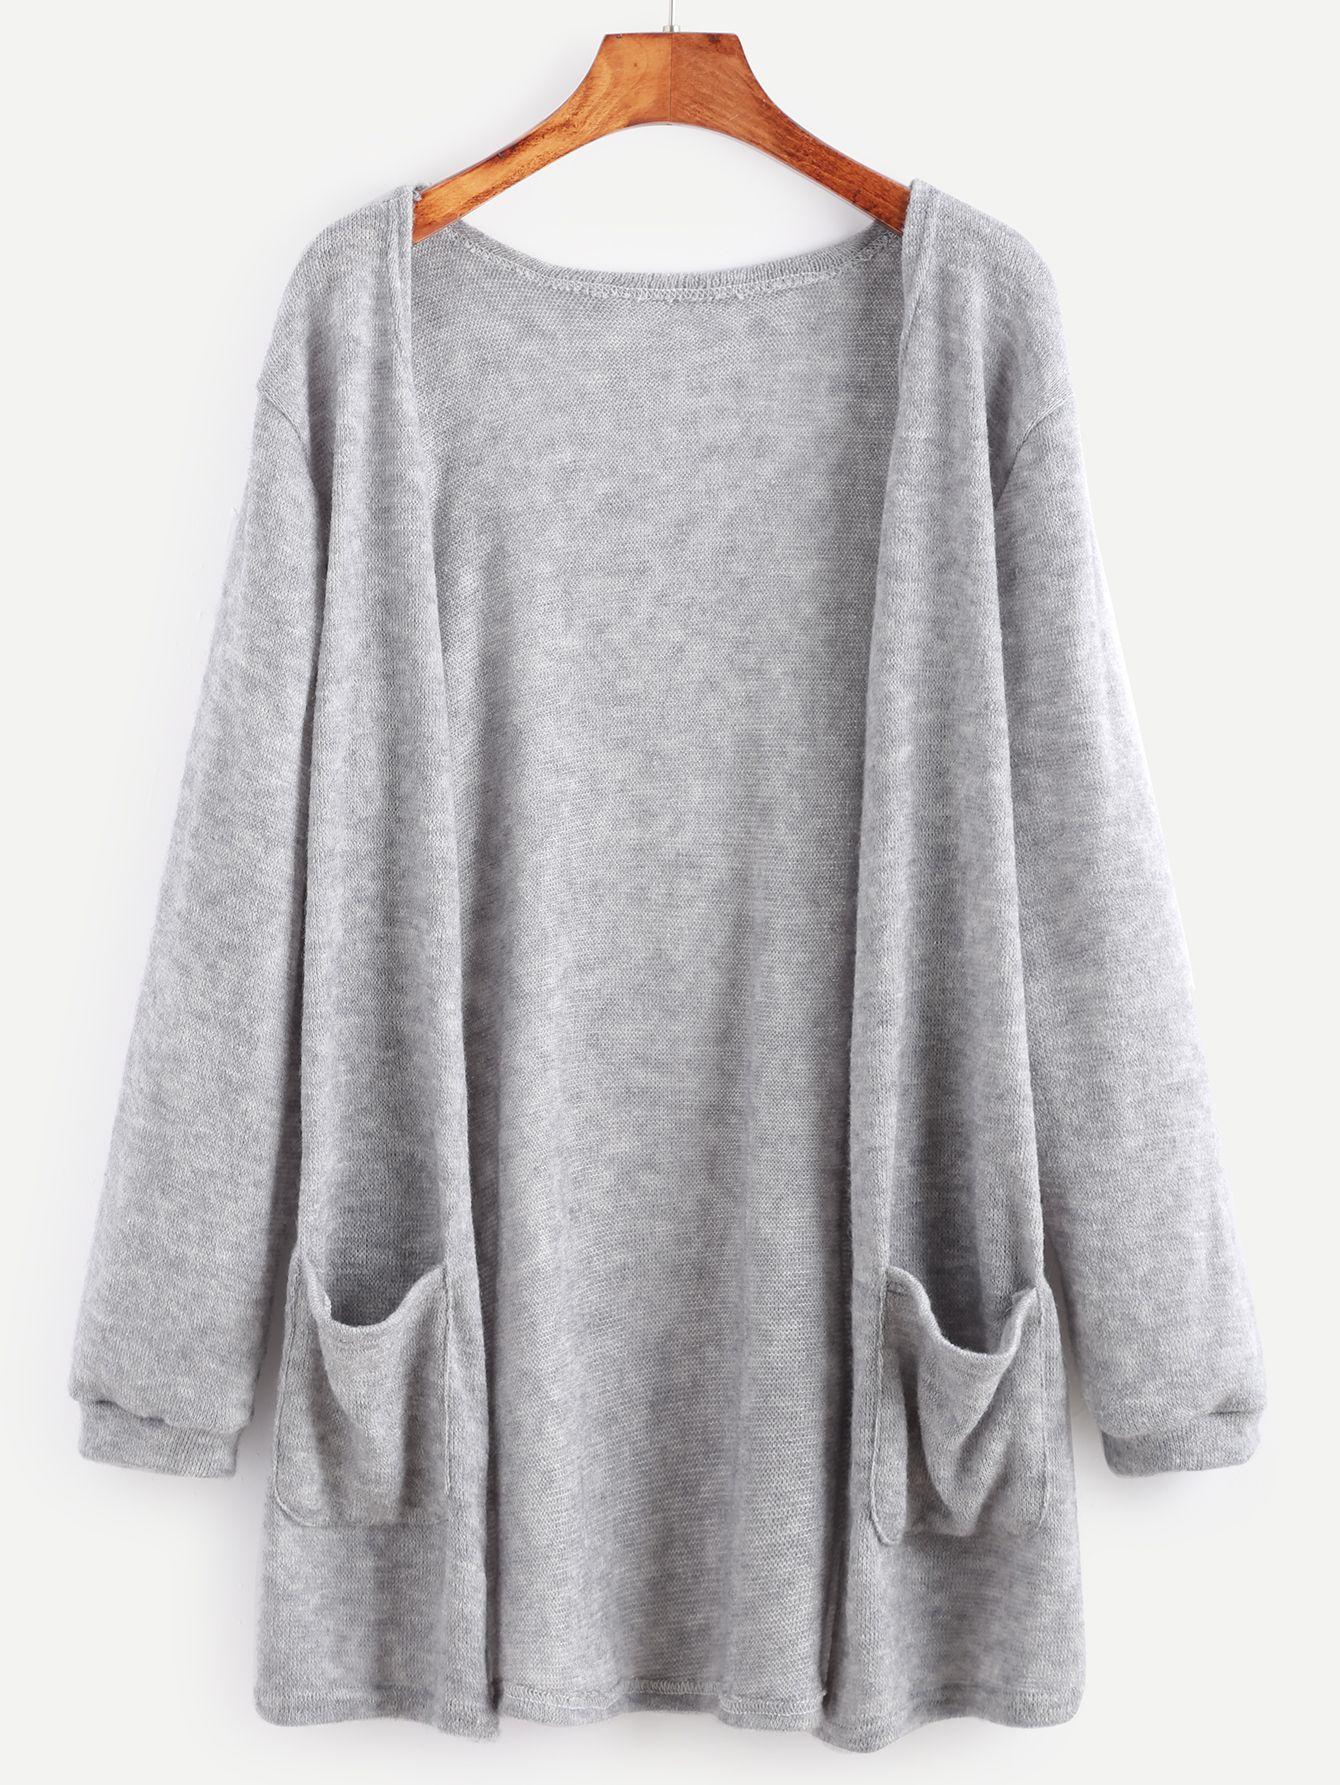 sueter tejido   CLOSET en 2018   Pinterest   Sweaters, Clothes y Sleeves